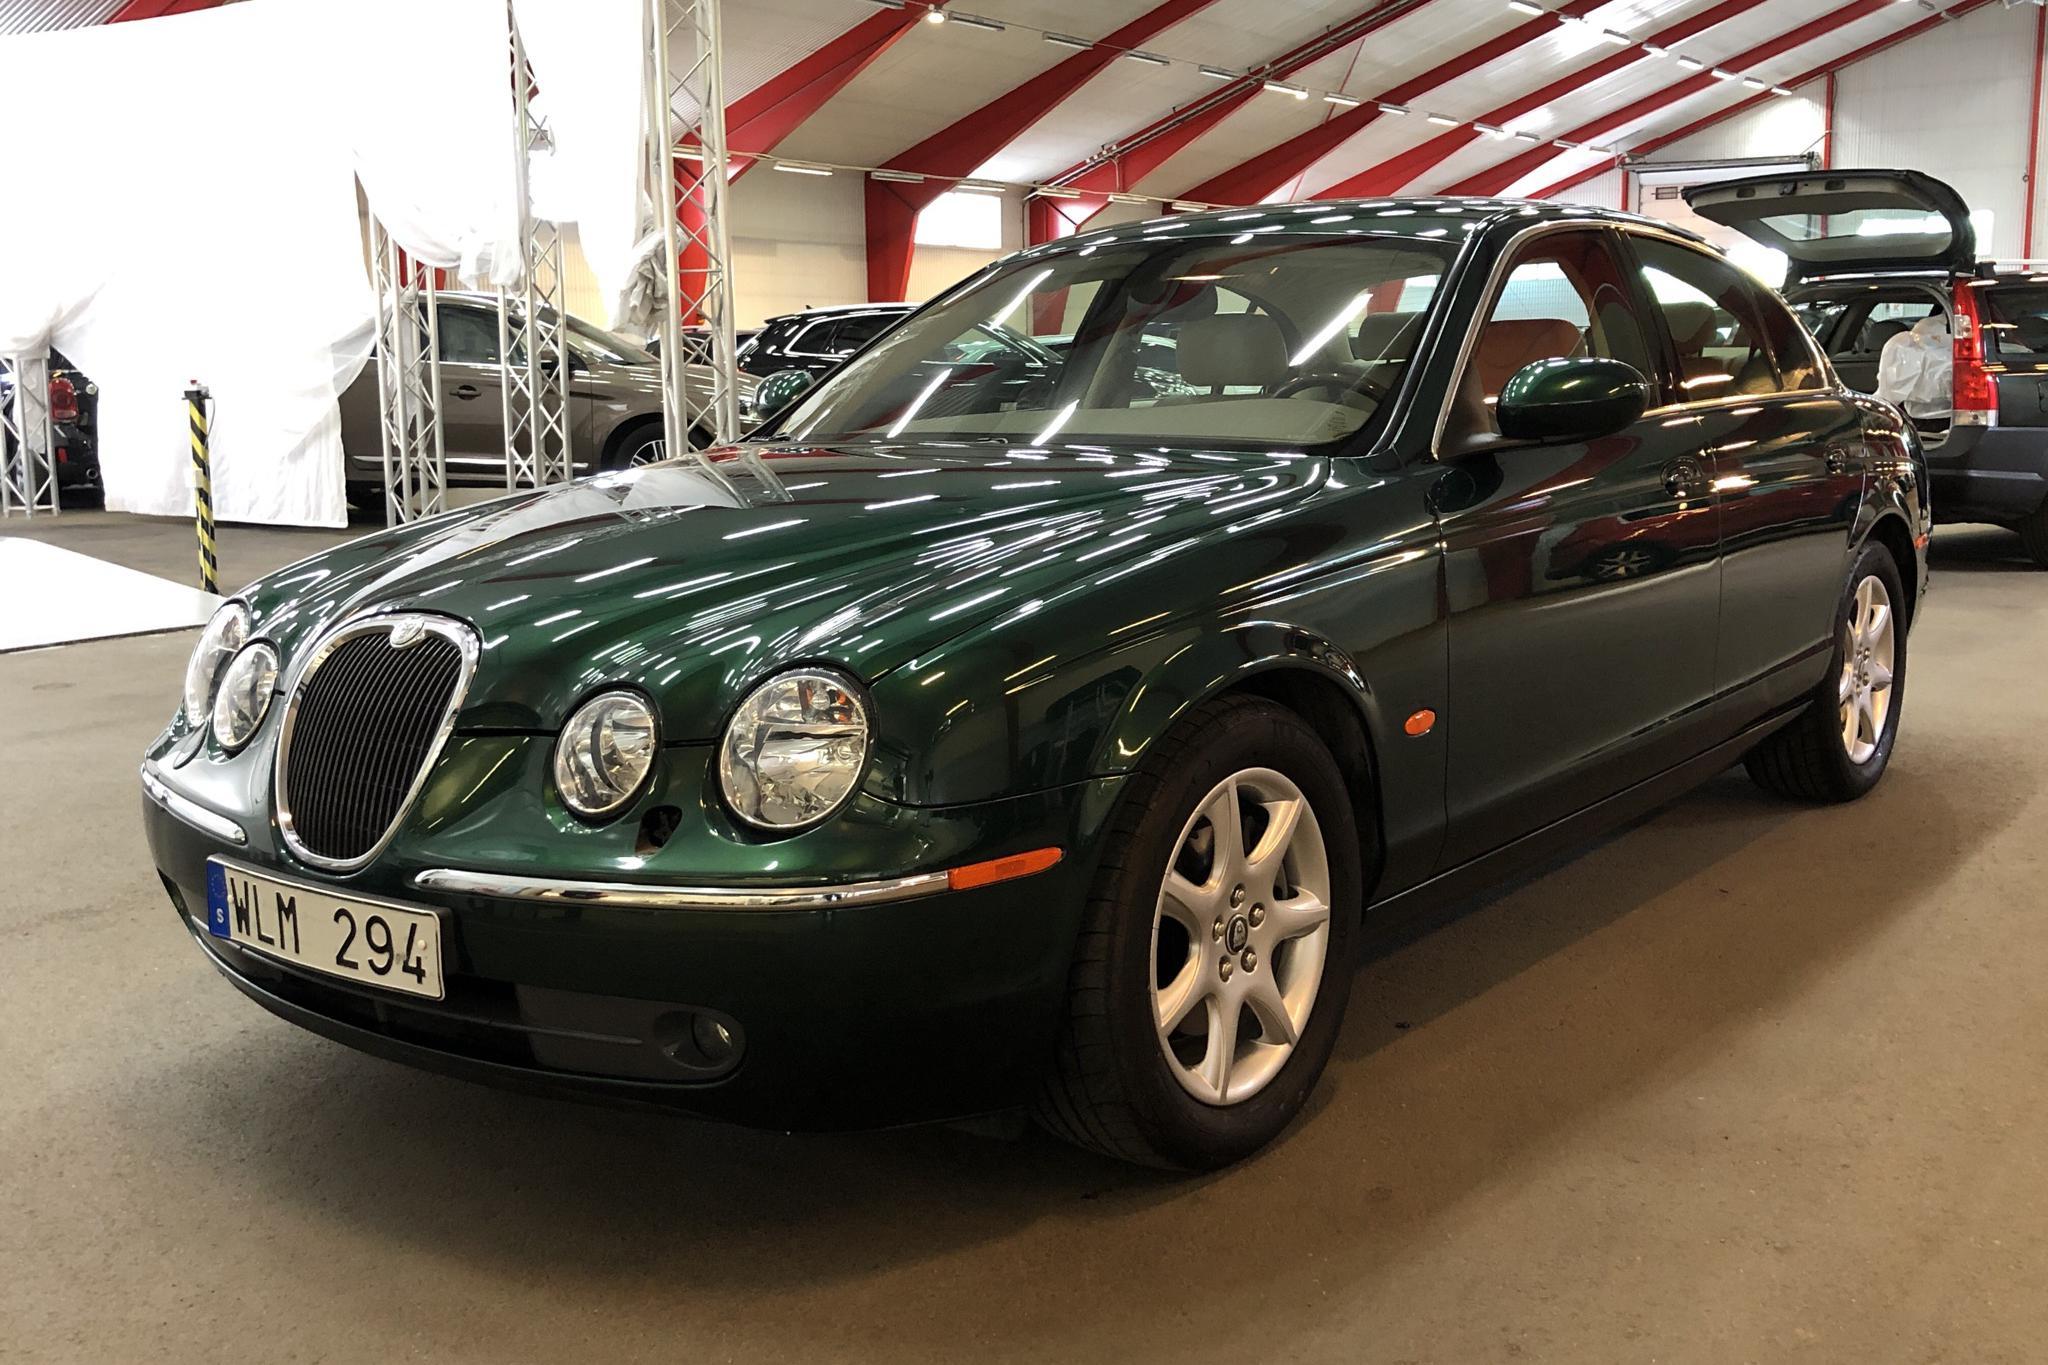 Jaguar S-type 2.5 V6 (200hk) - 3 405 mil - Automat - grön - 2005